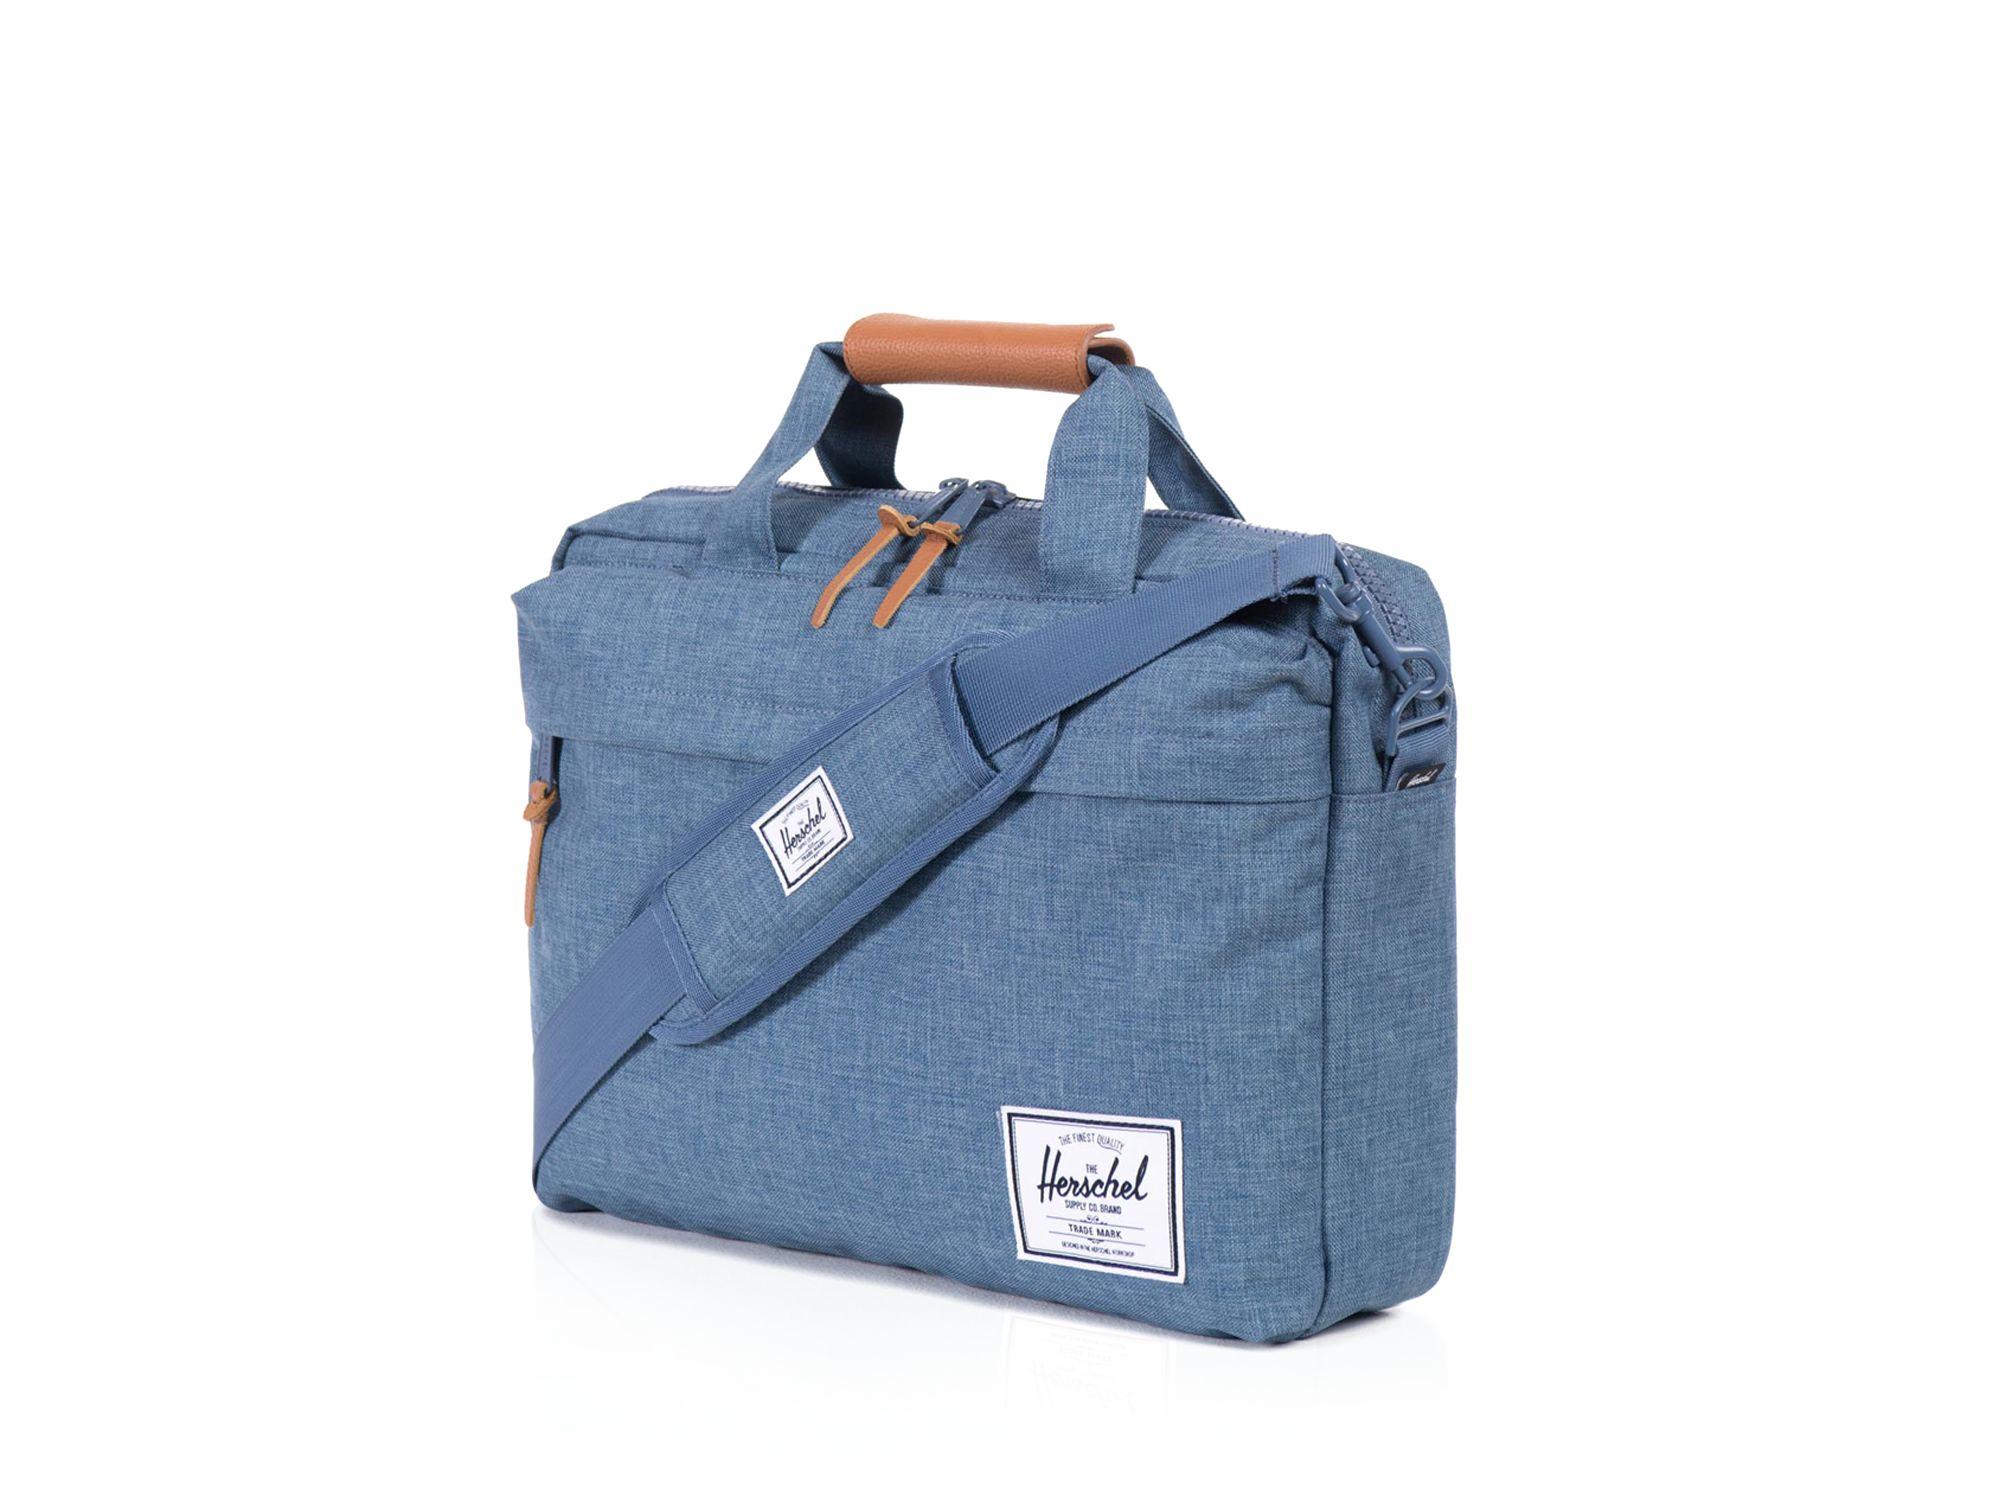 Herschel Supply Co Clark Messenger Bag In Blue For Men Lyst